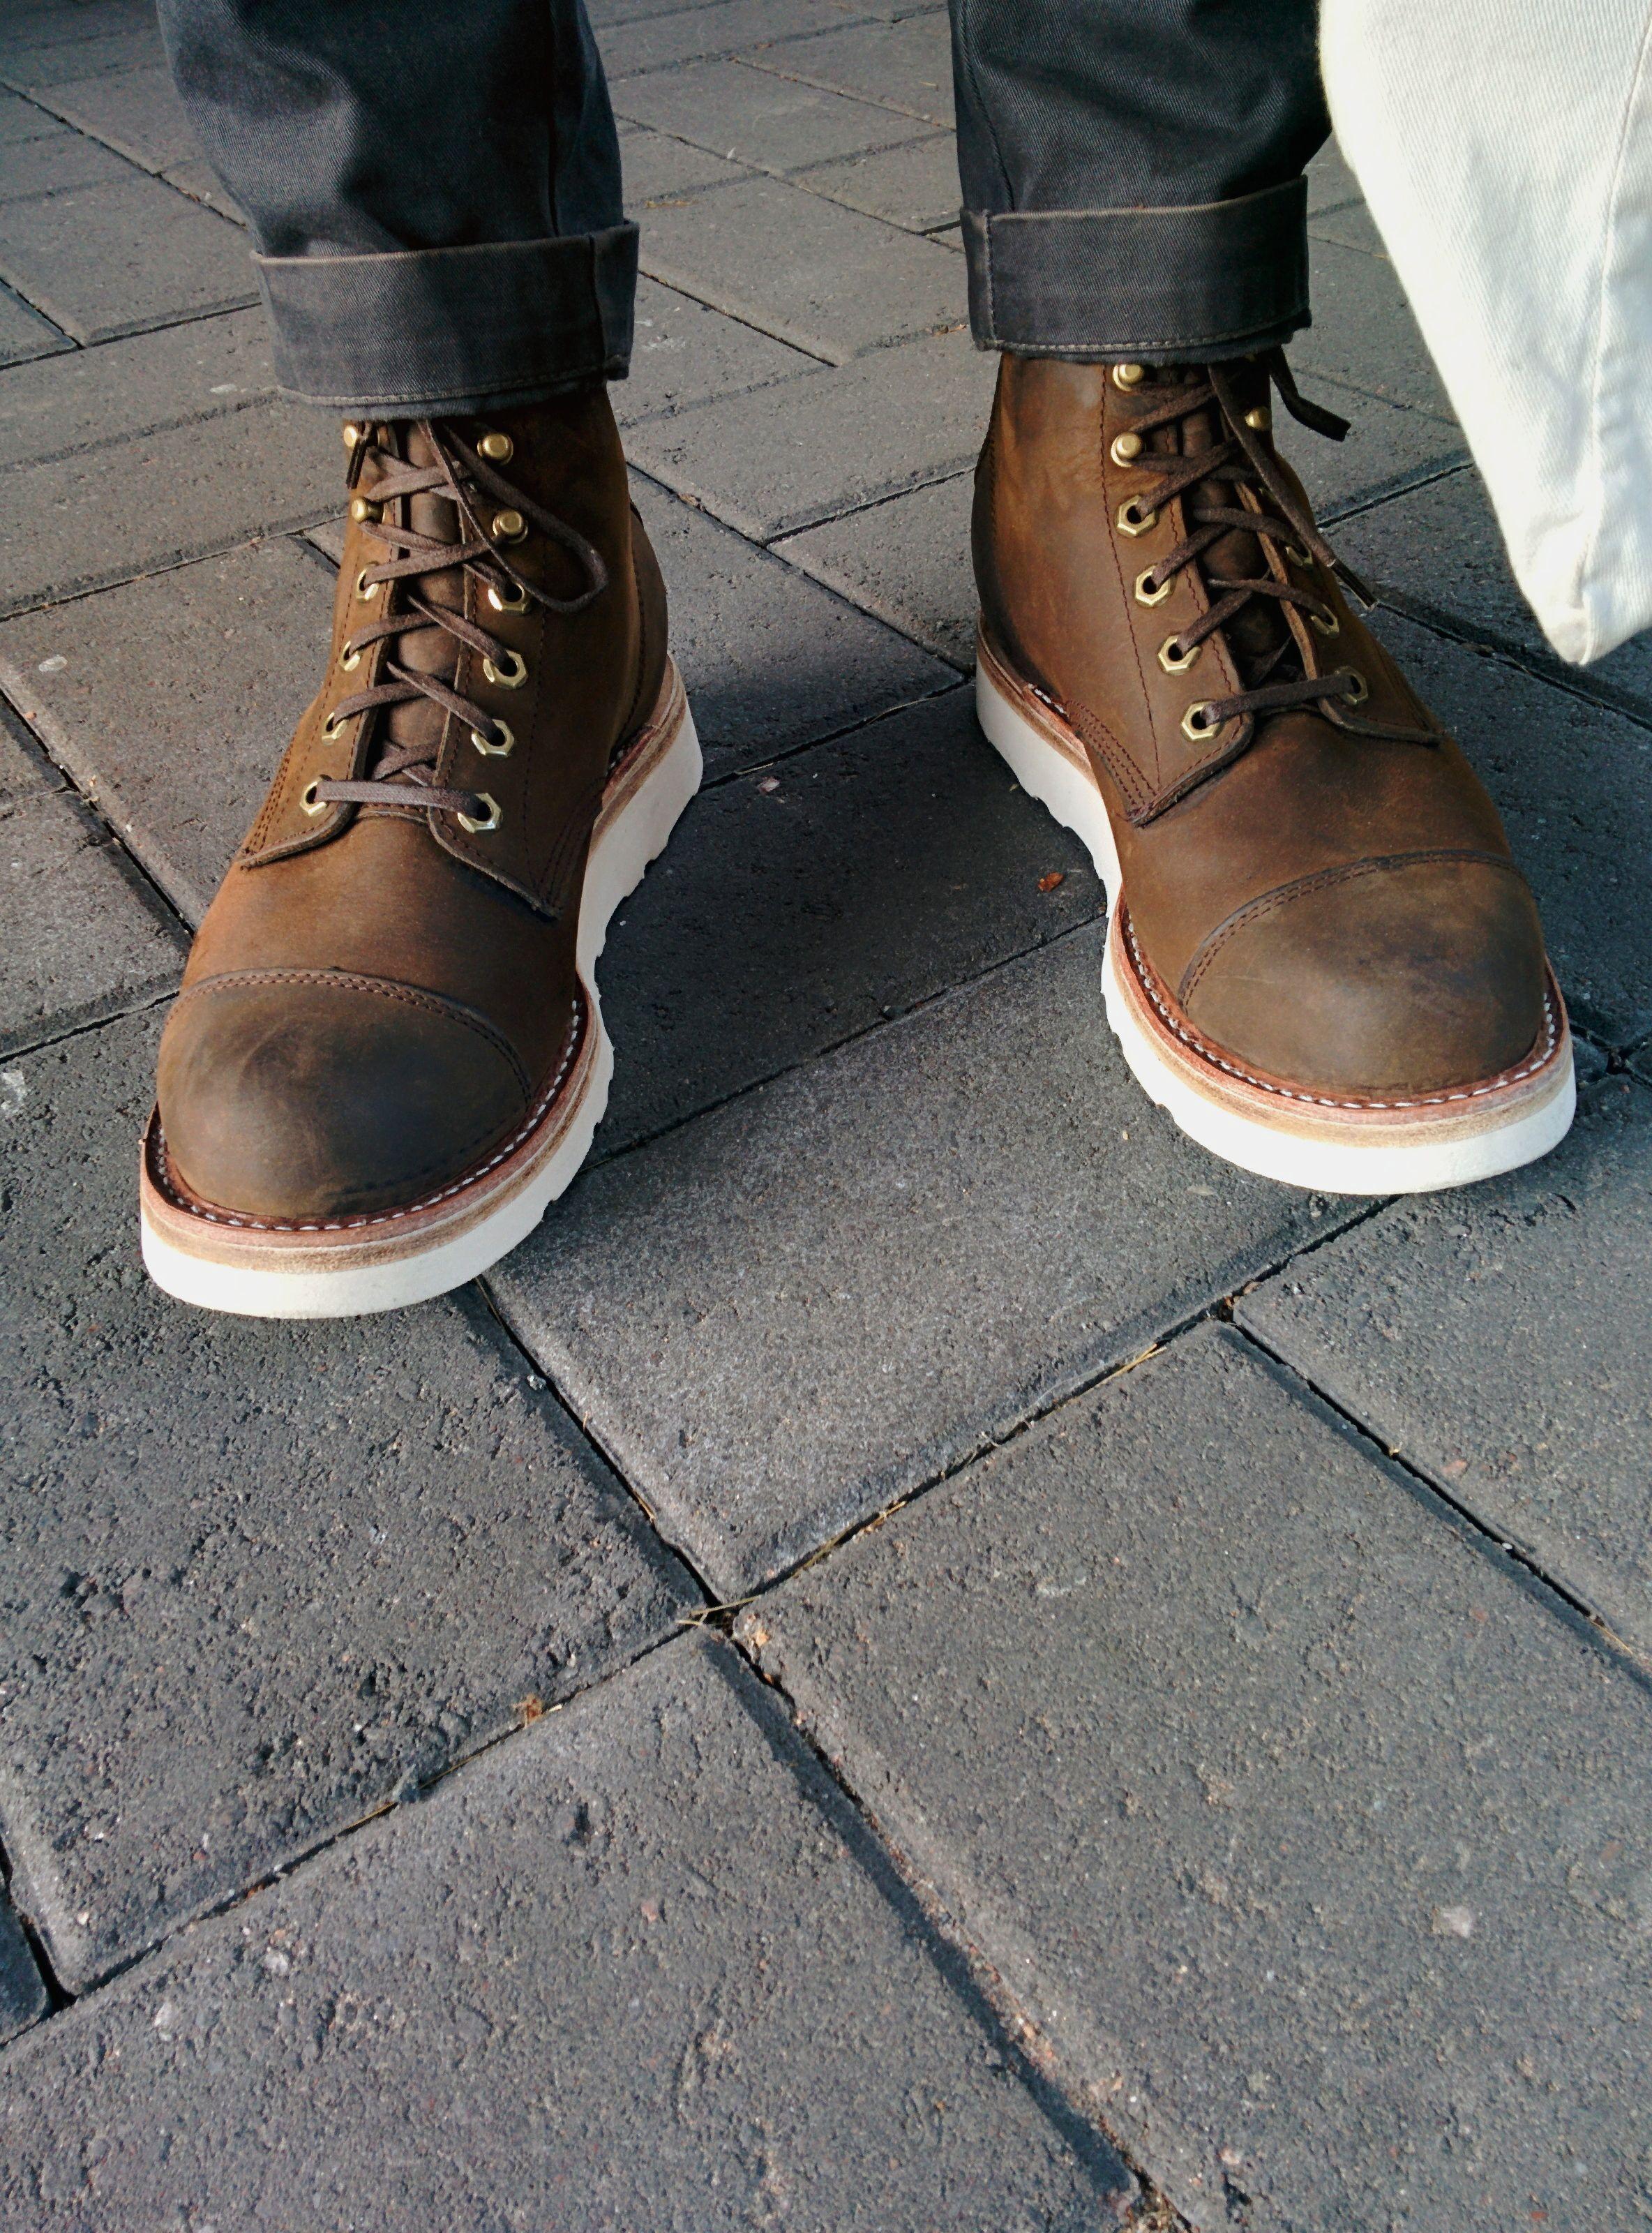 a7afa672b5d My Chippewa x LL Bean Katahdin Iron Works boots resoled with Vibram ...